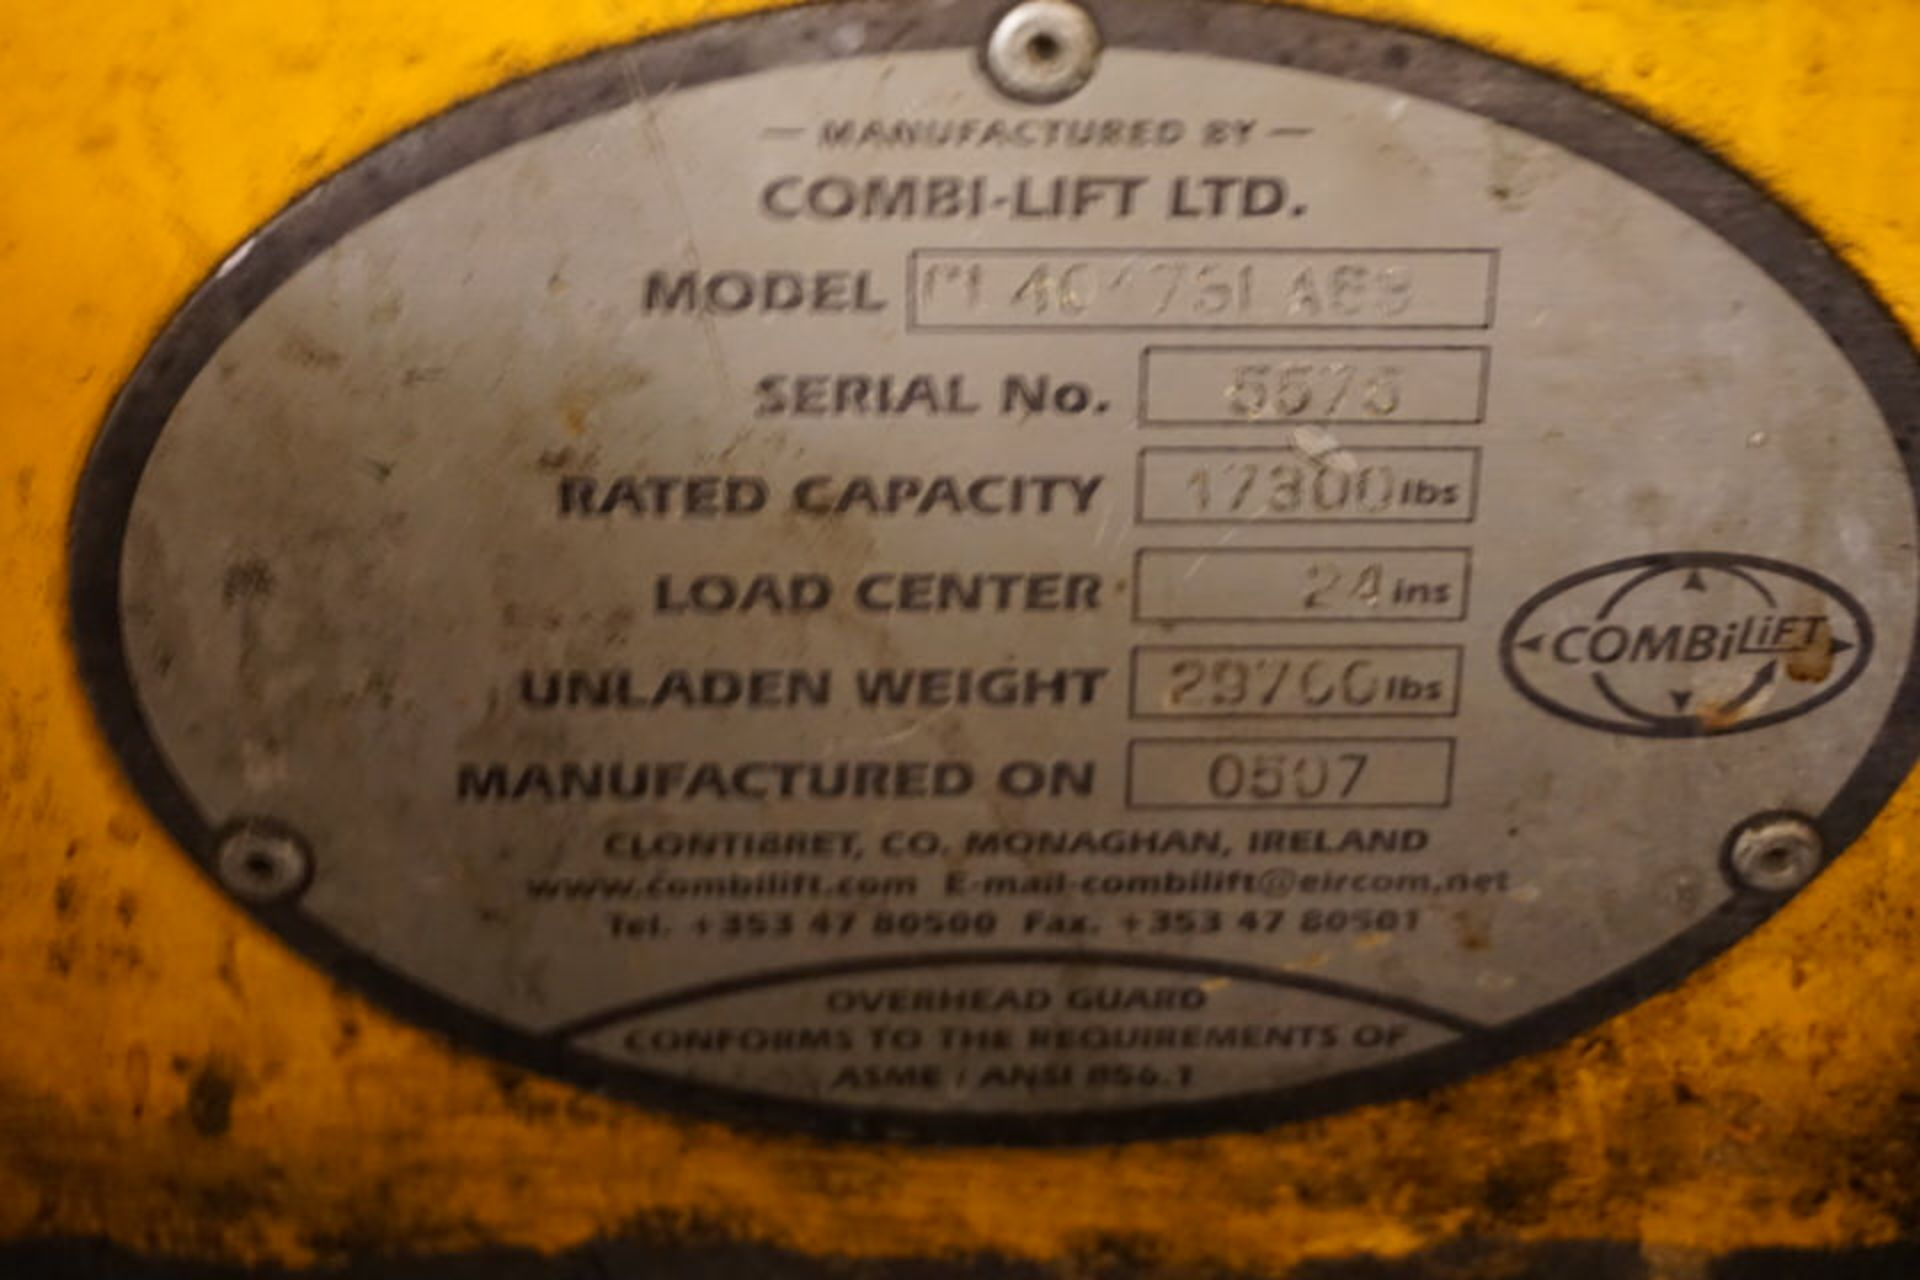 Lot 10 - (2007) COMBI-LIFT MDL. C17300